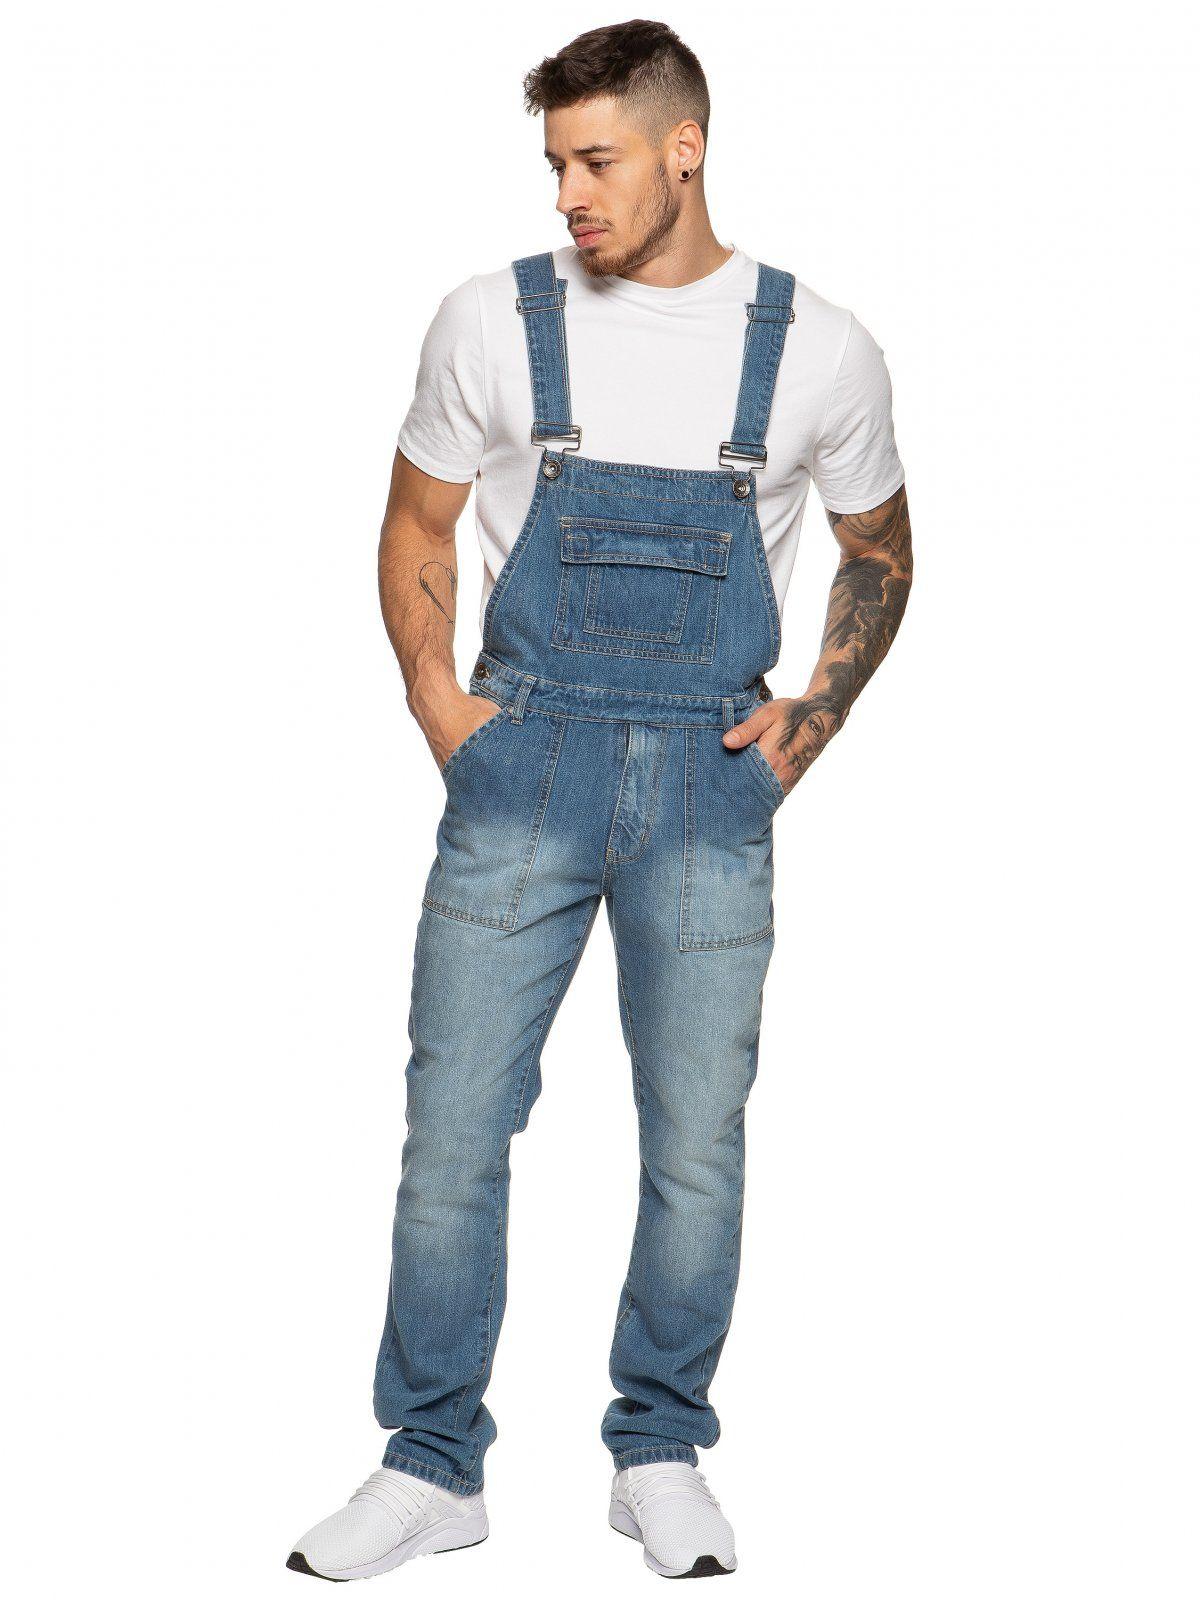 Designer Mens Blue Fashionable Denim Overall Dungarees | Enzo Designer Menswear